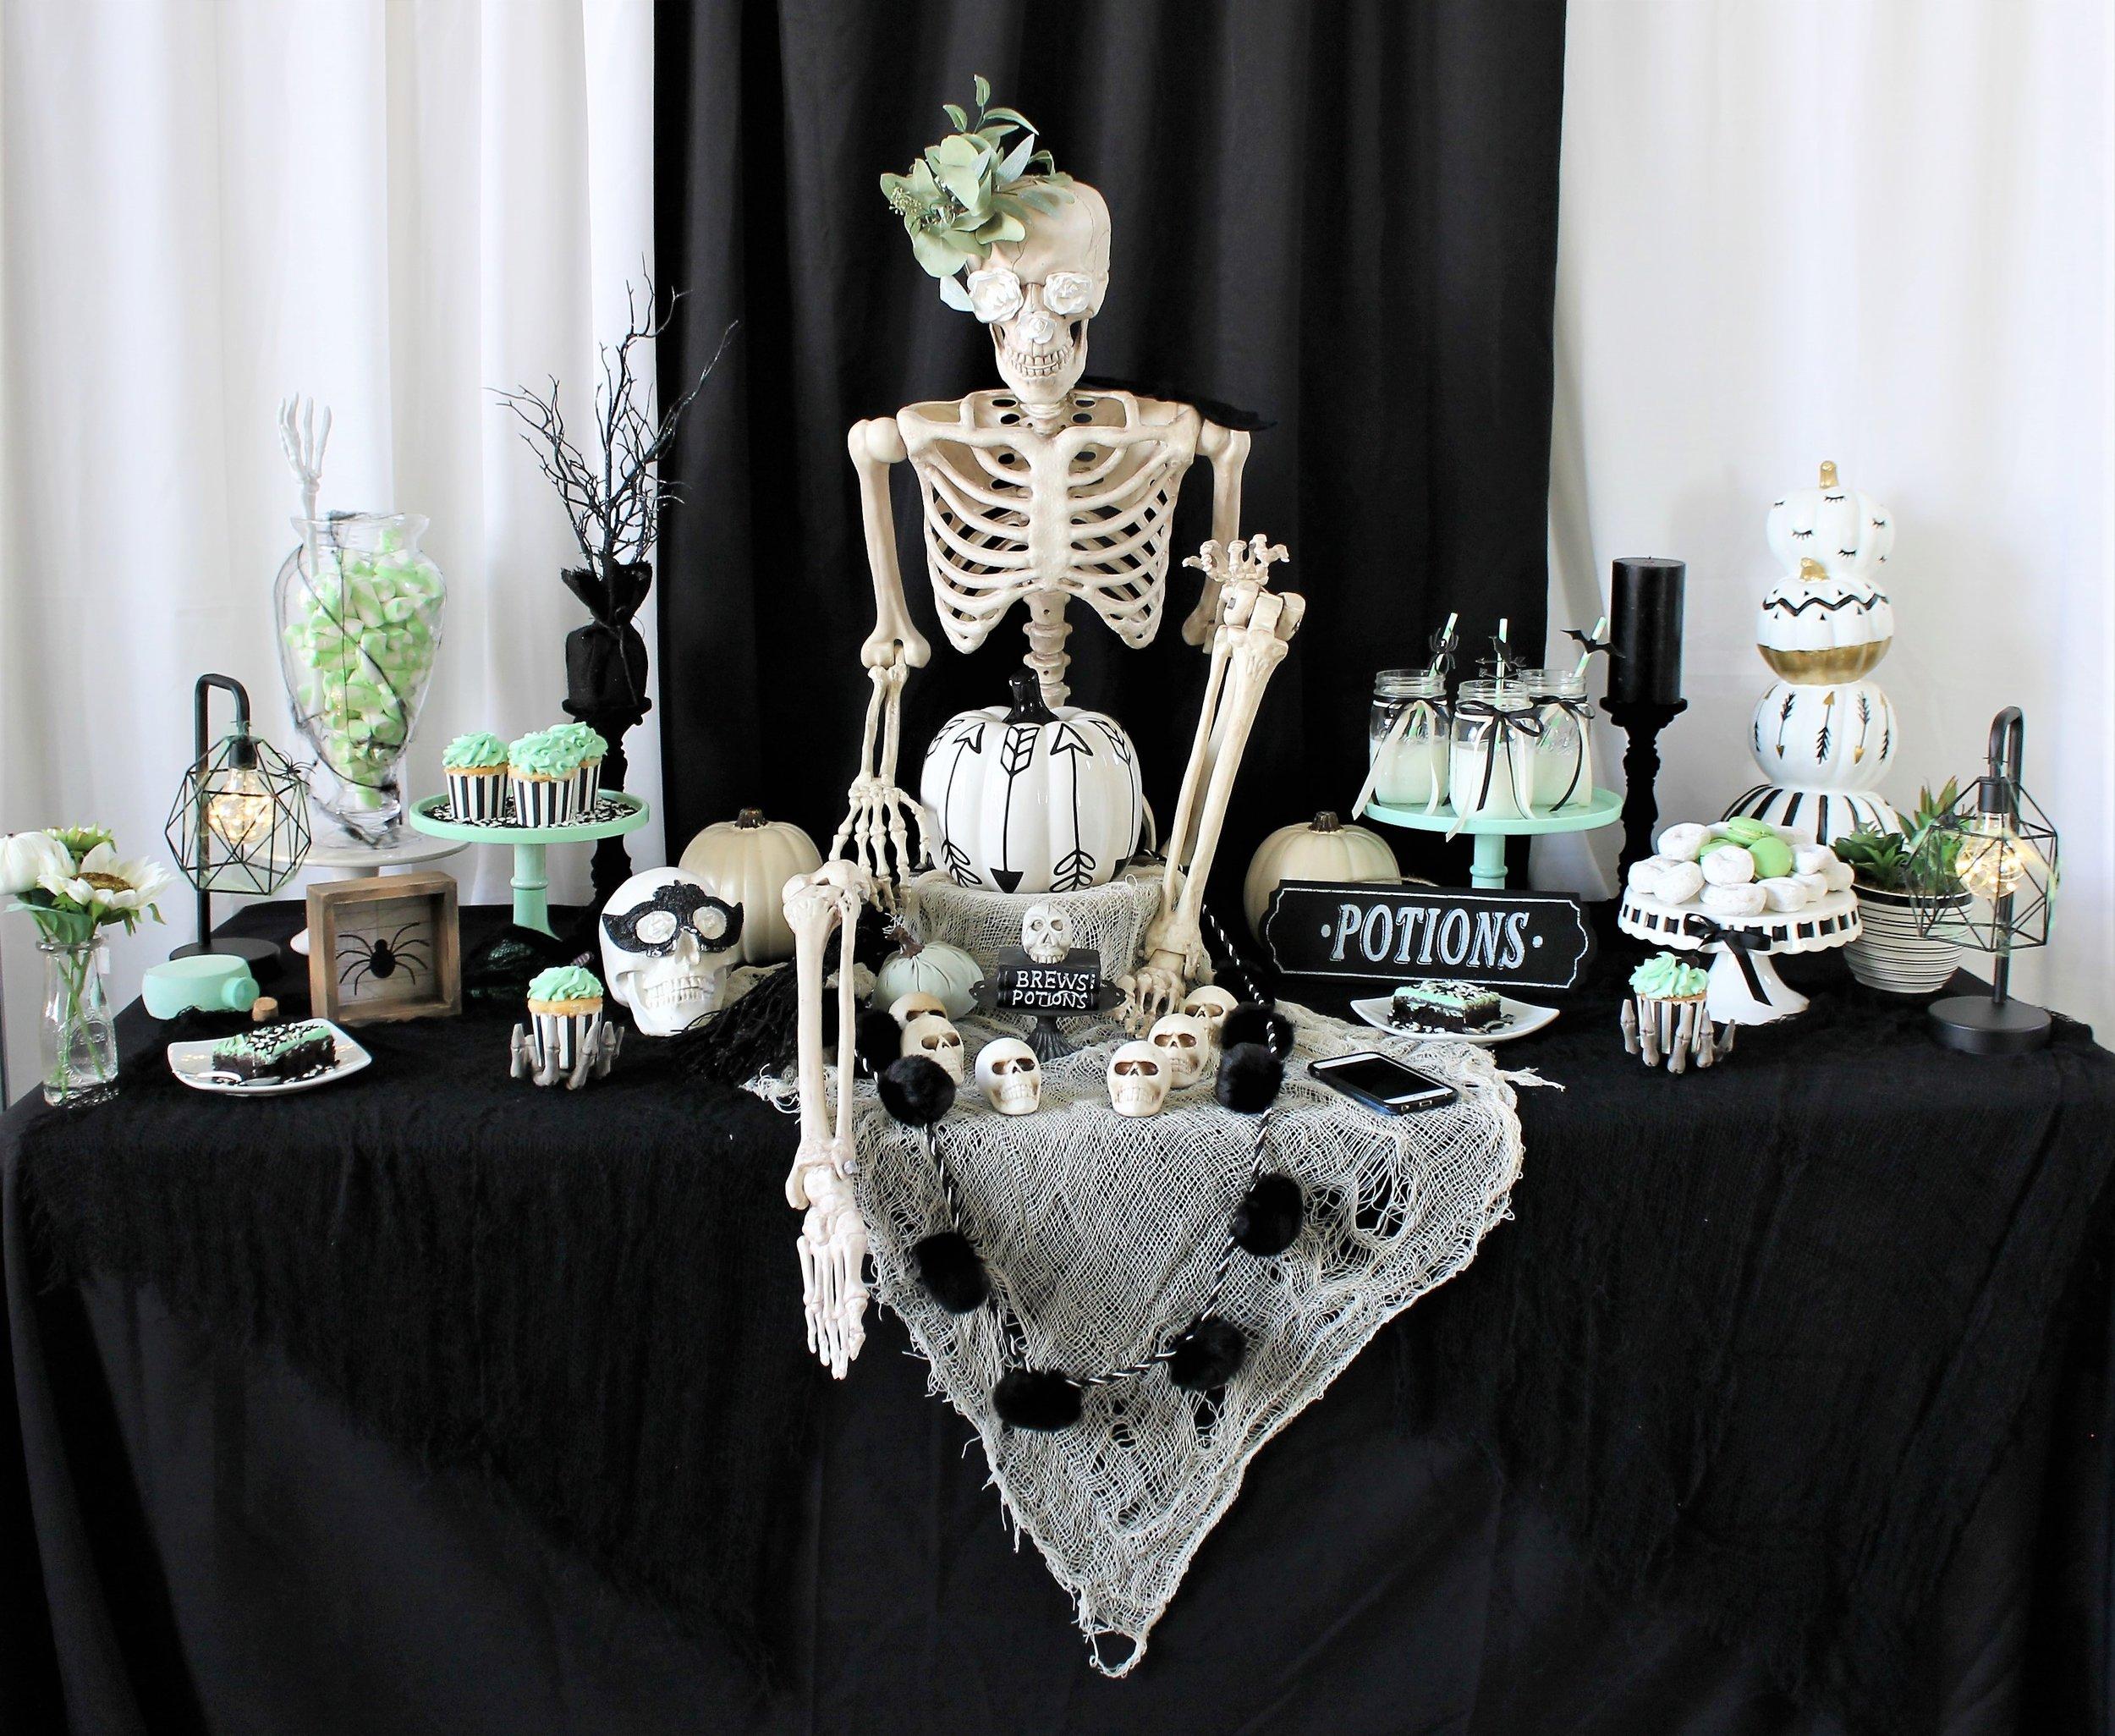 Halloween Party Ideas-Pastel Halloween -Mint Halloween-Halloween Dessert Table-Halloween Desserts-Halloween Candy Table-Boho Halloween-Halloween Skeleton-Halloween Party Ideas-www.SugarPartiesLA.com